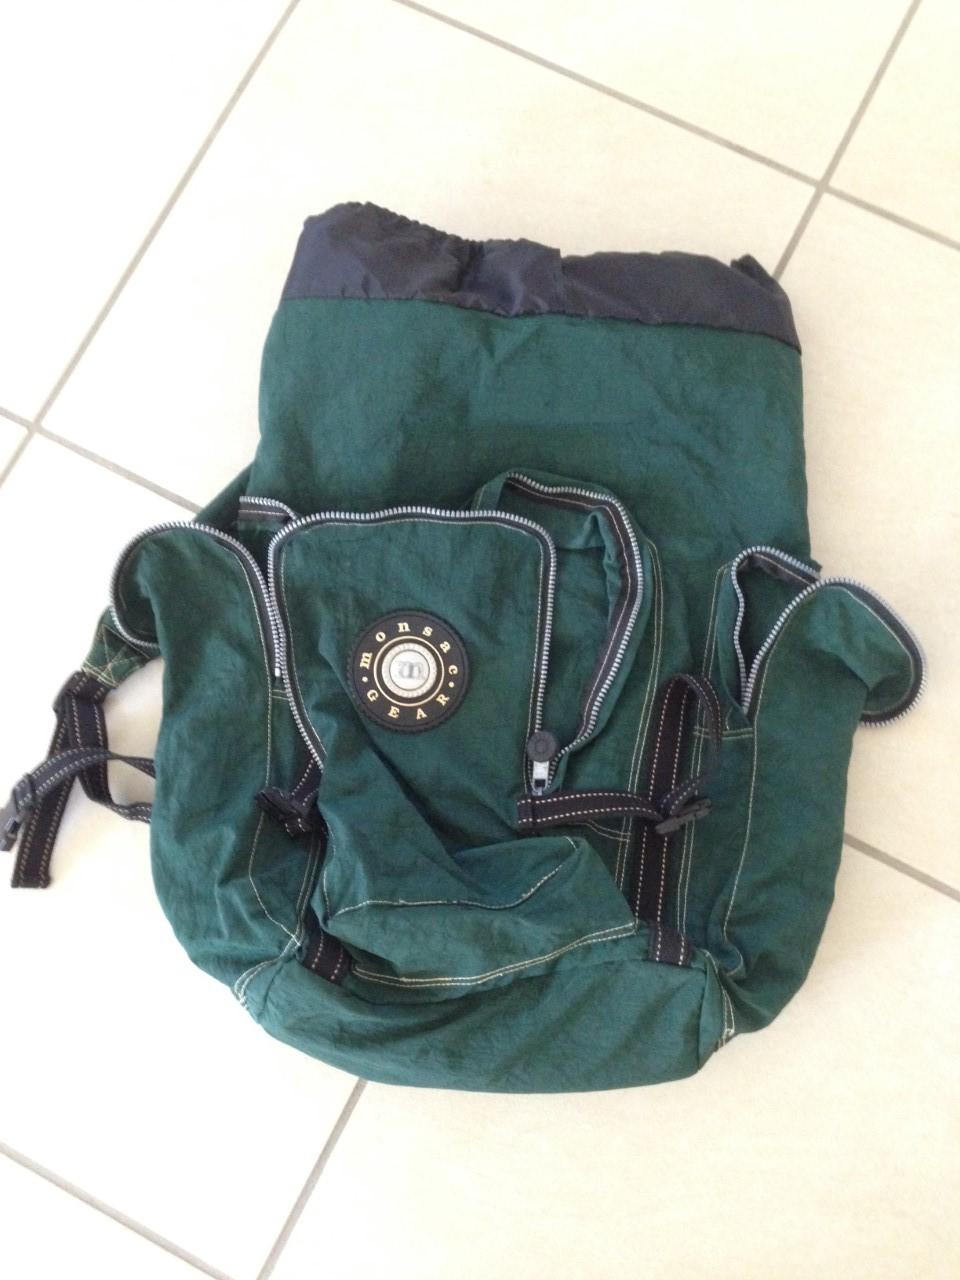 1st backpack